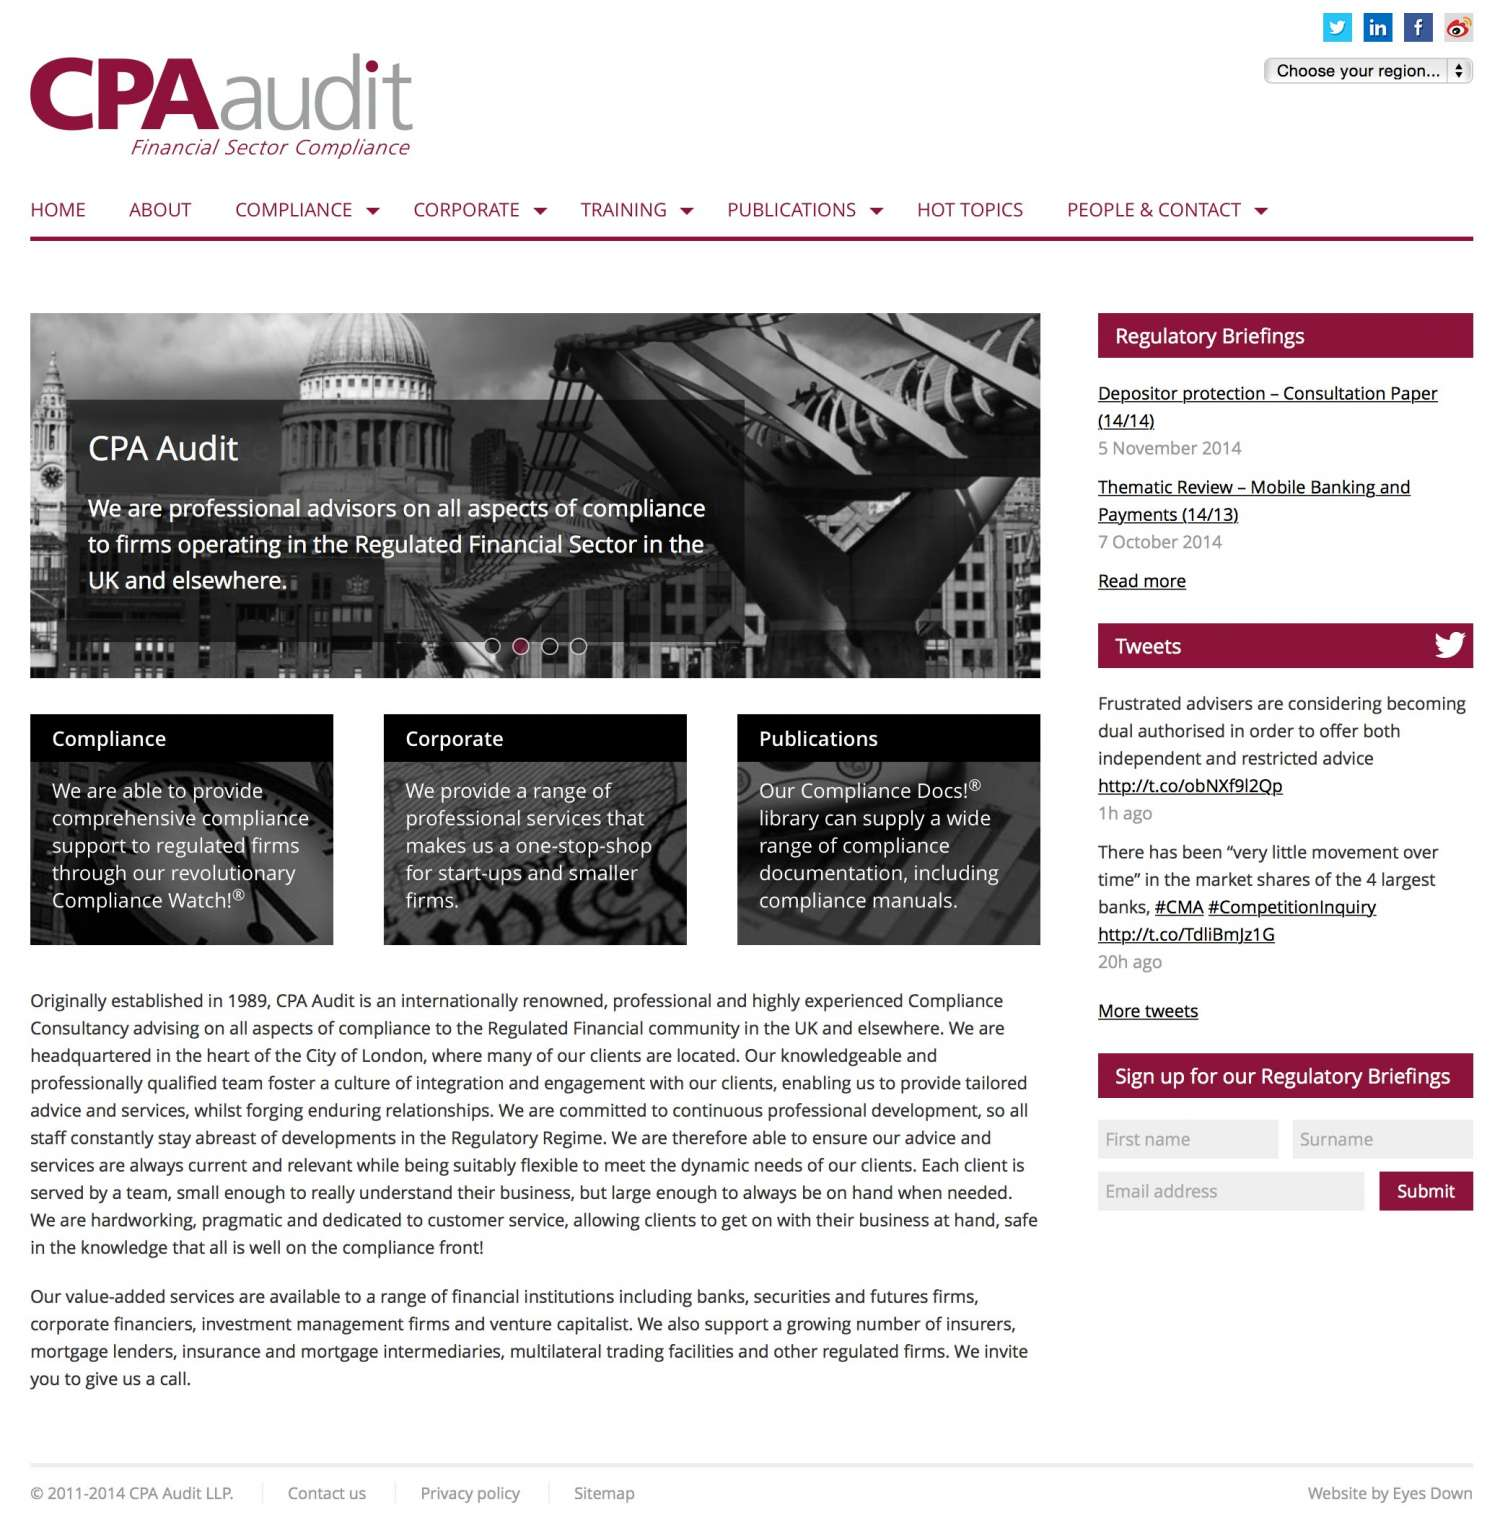 CPA Audit